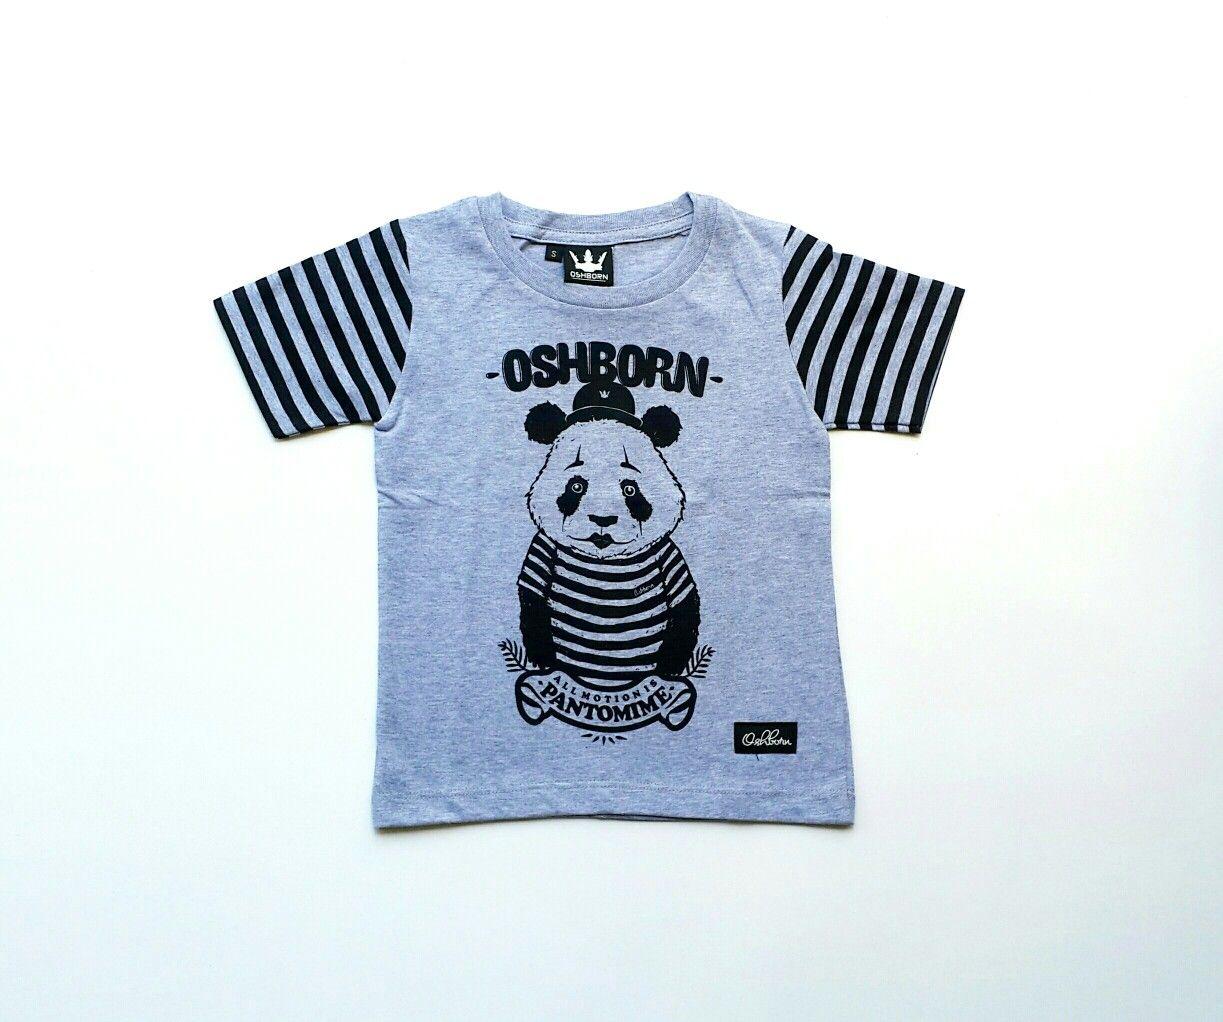 Shirt design boy 2016 - Pandomim Kids Boys Girls Tshirt